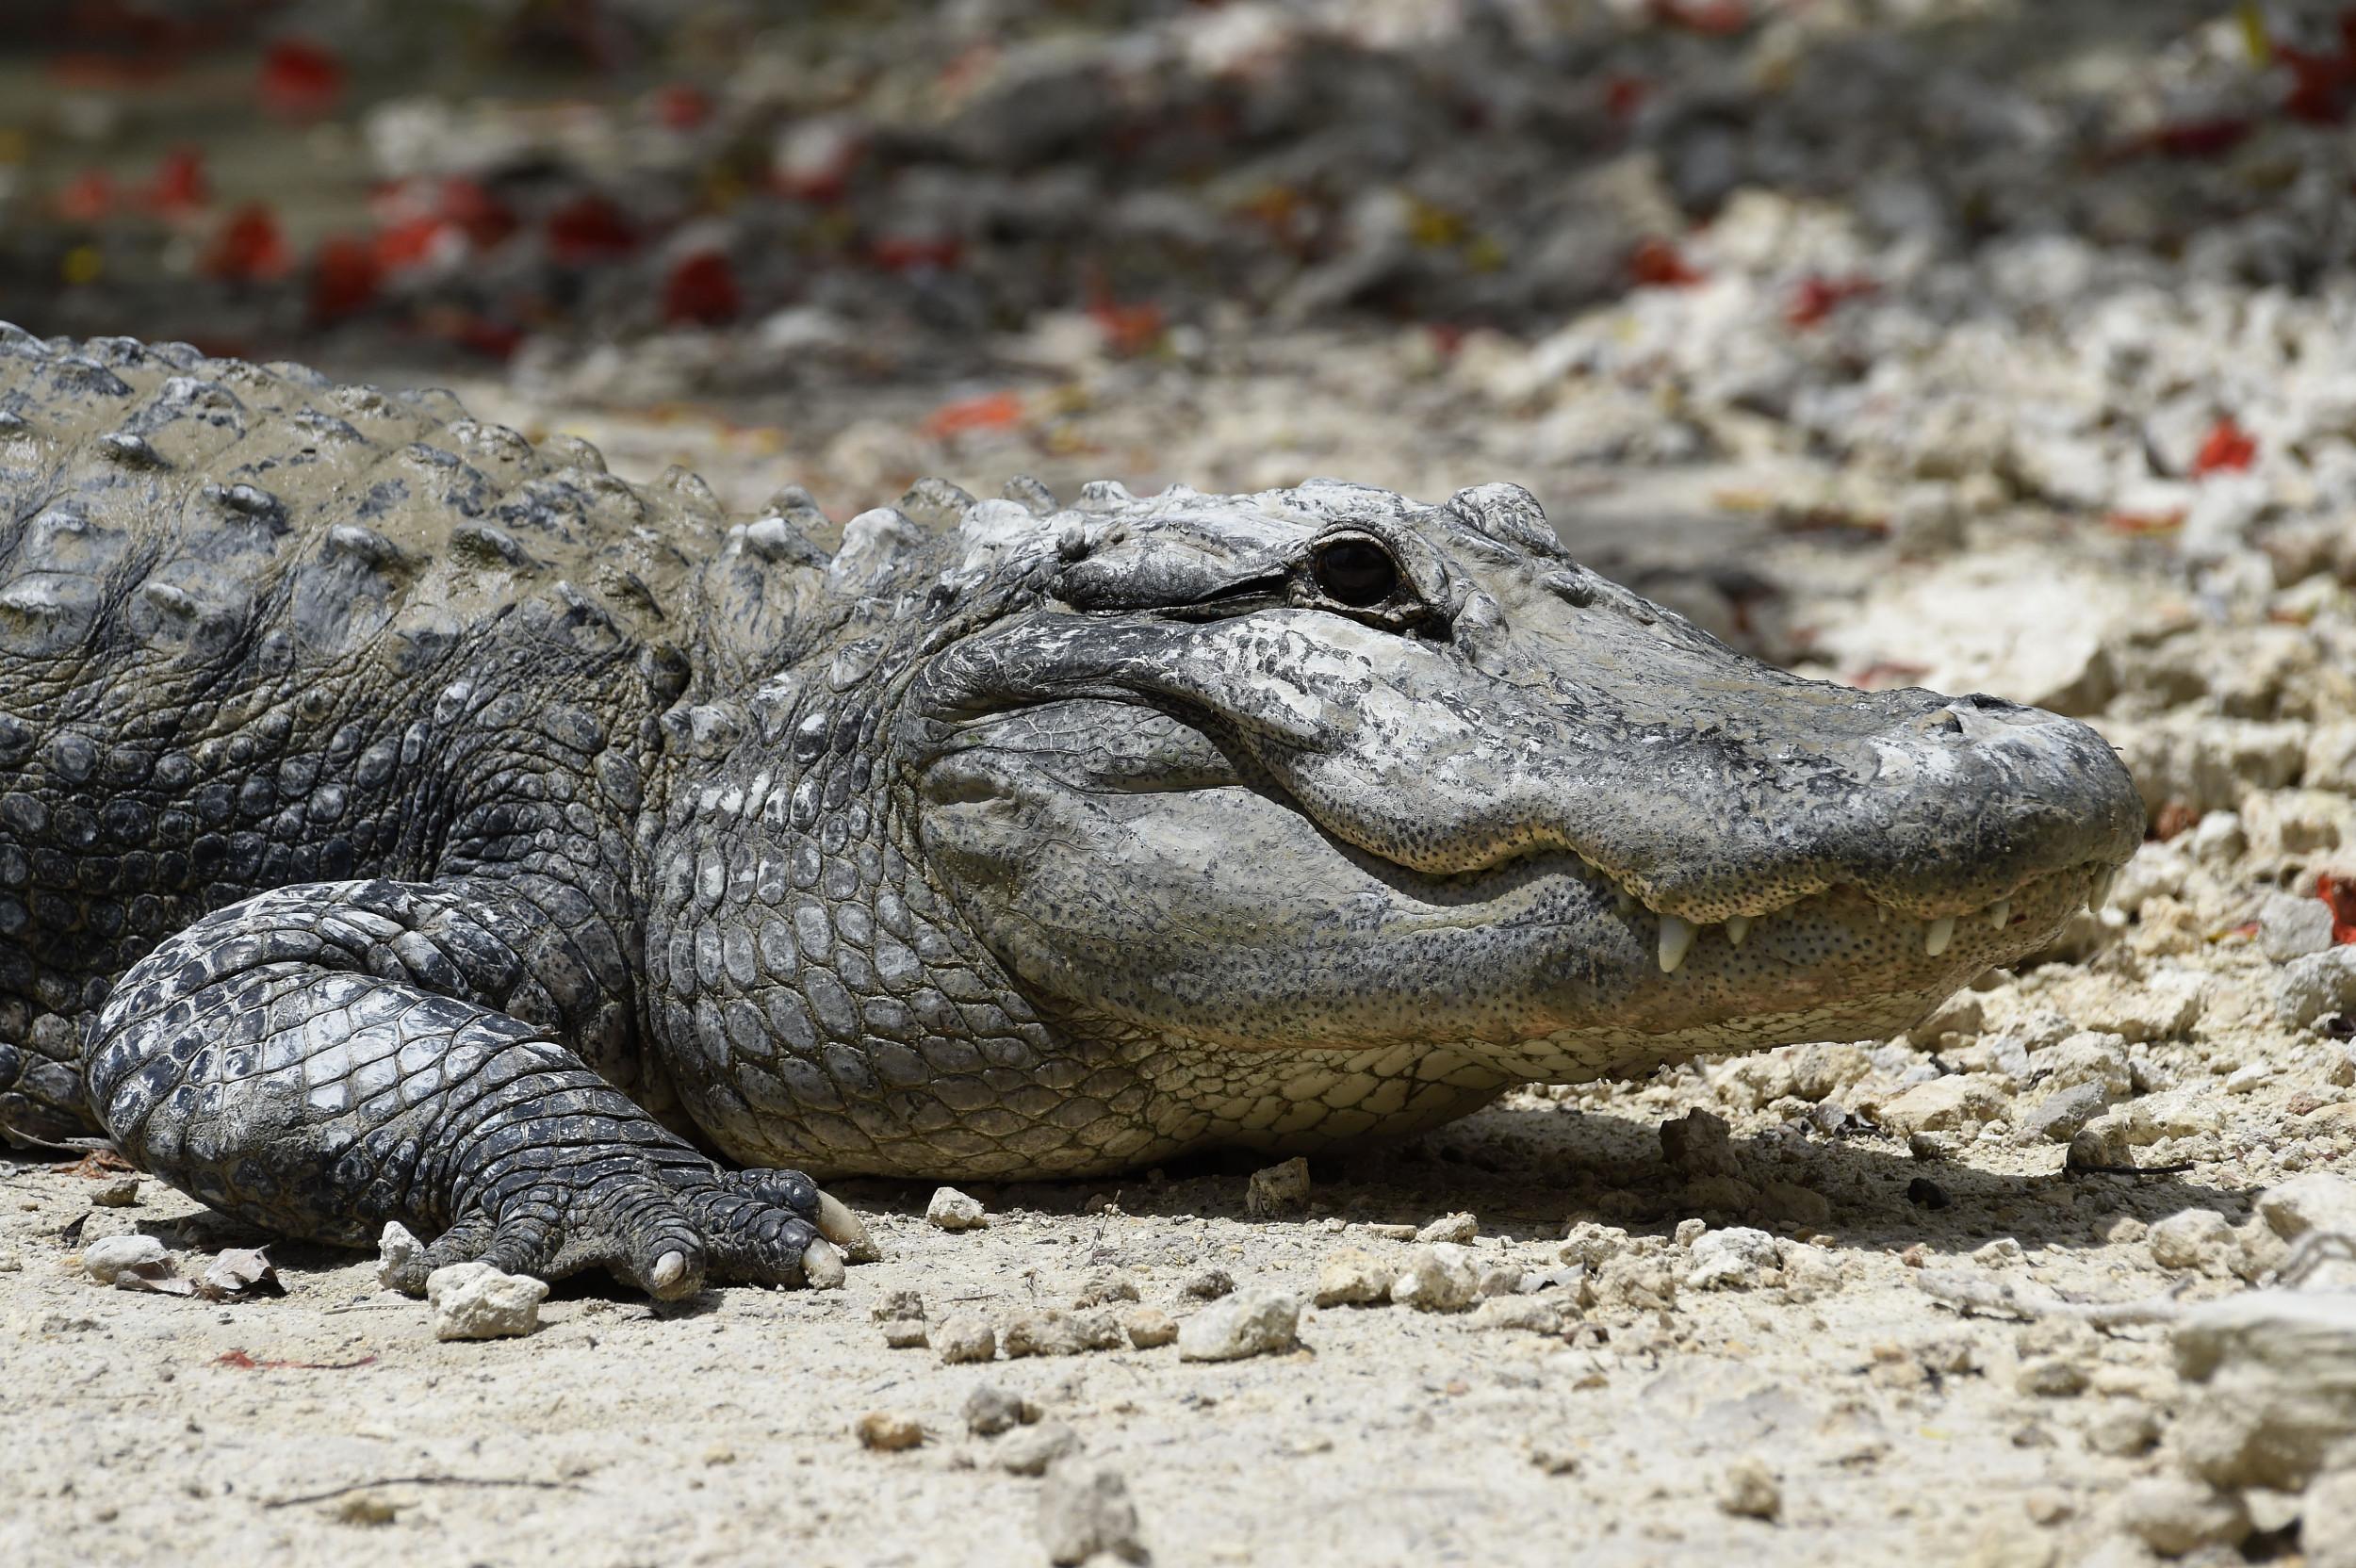 Alligator Filmed Swimming In The Ocean Off Florida Beach